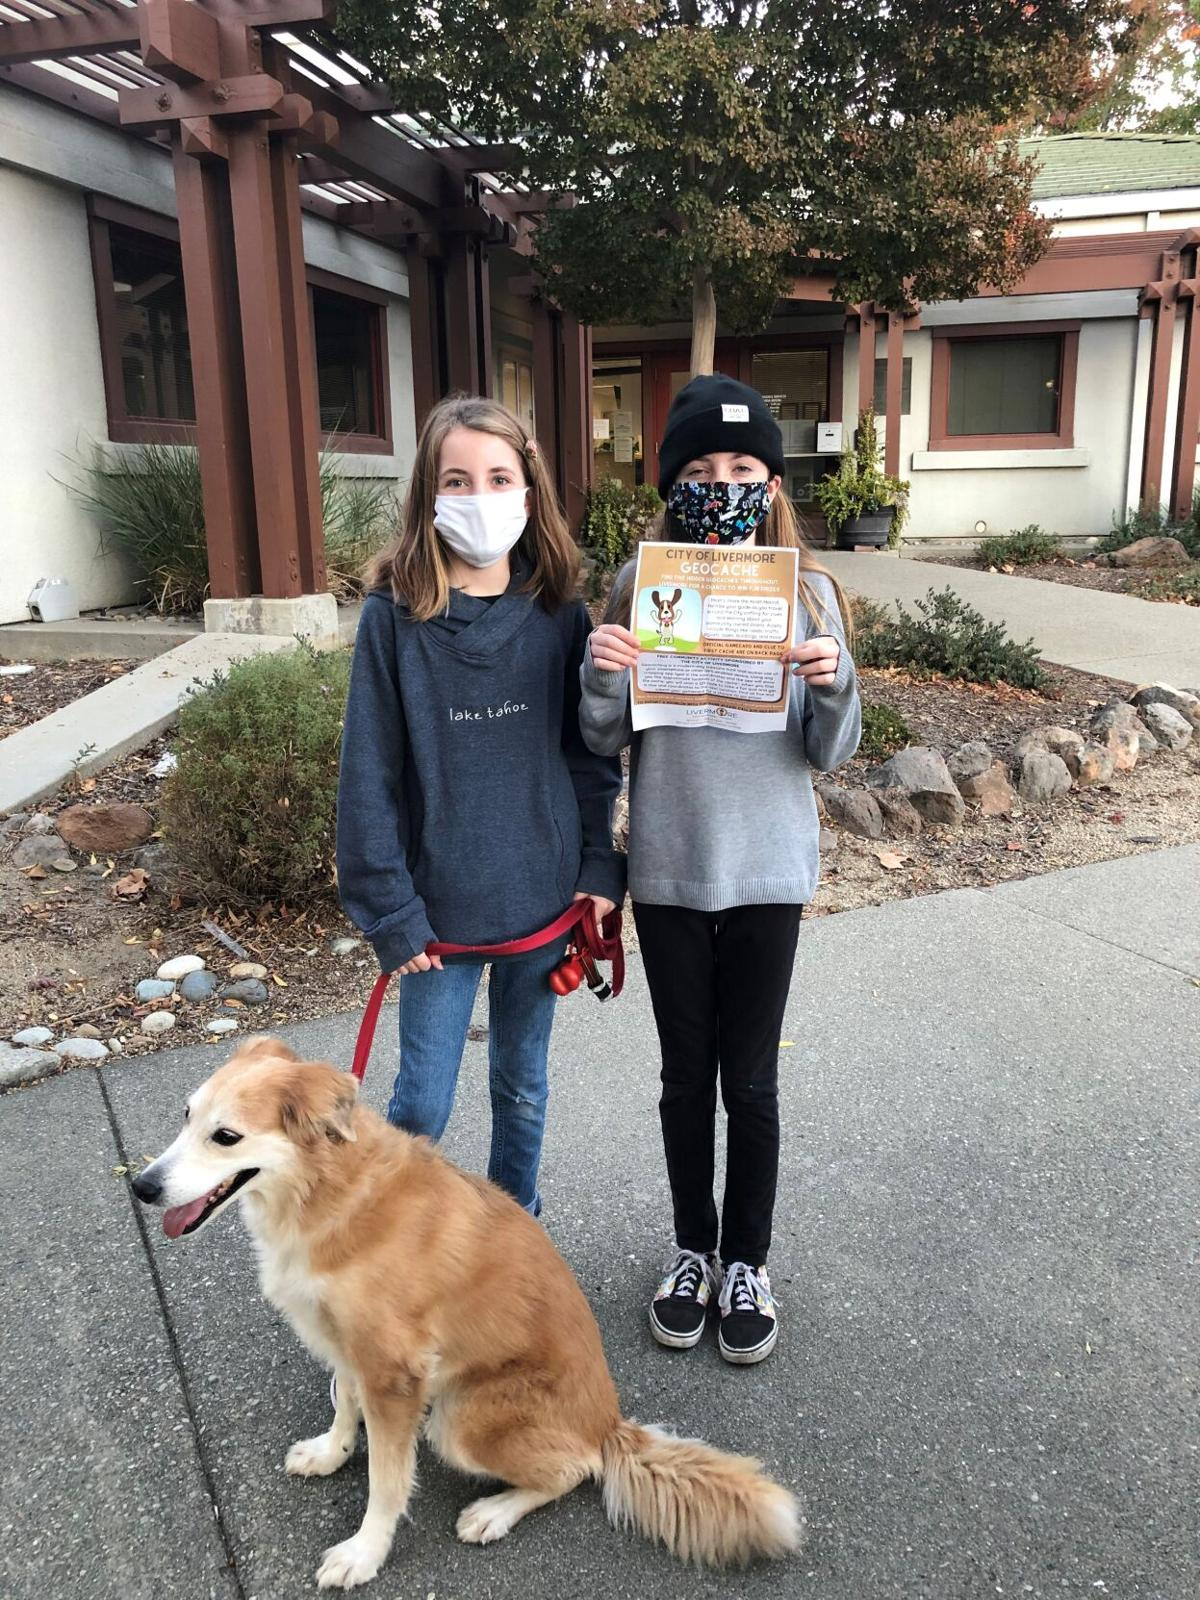 LIV - Geocach - Twins with dog and flier.jpg